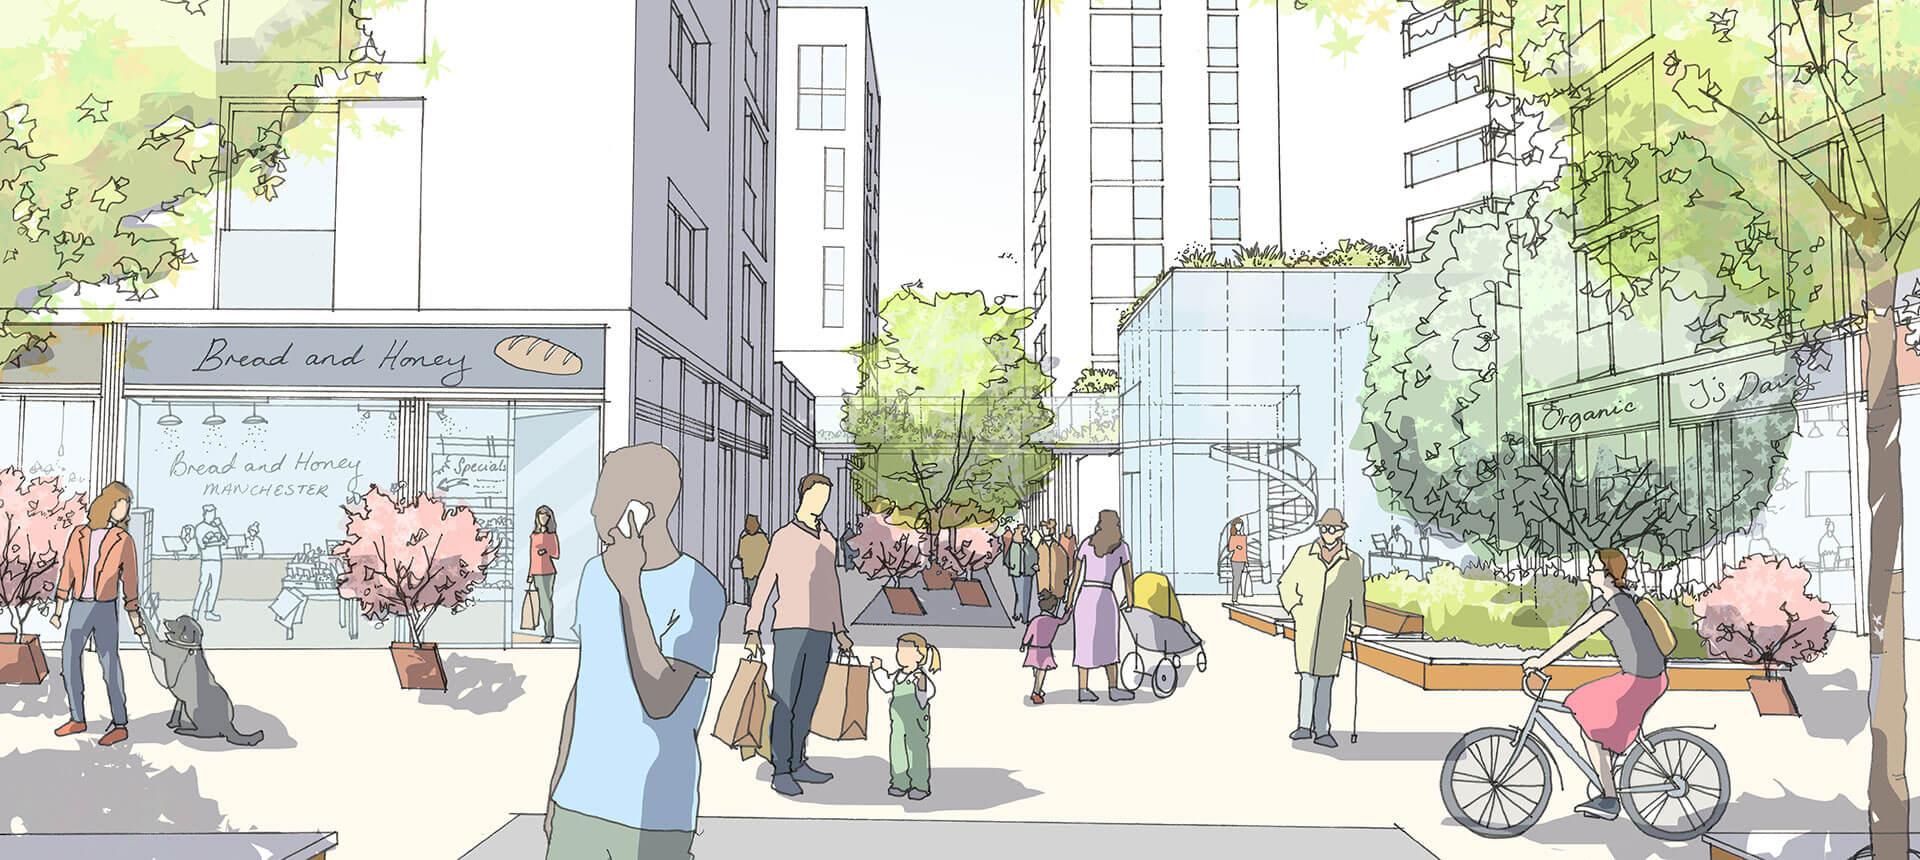 First Street UK Streetview Illustration